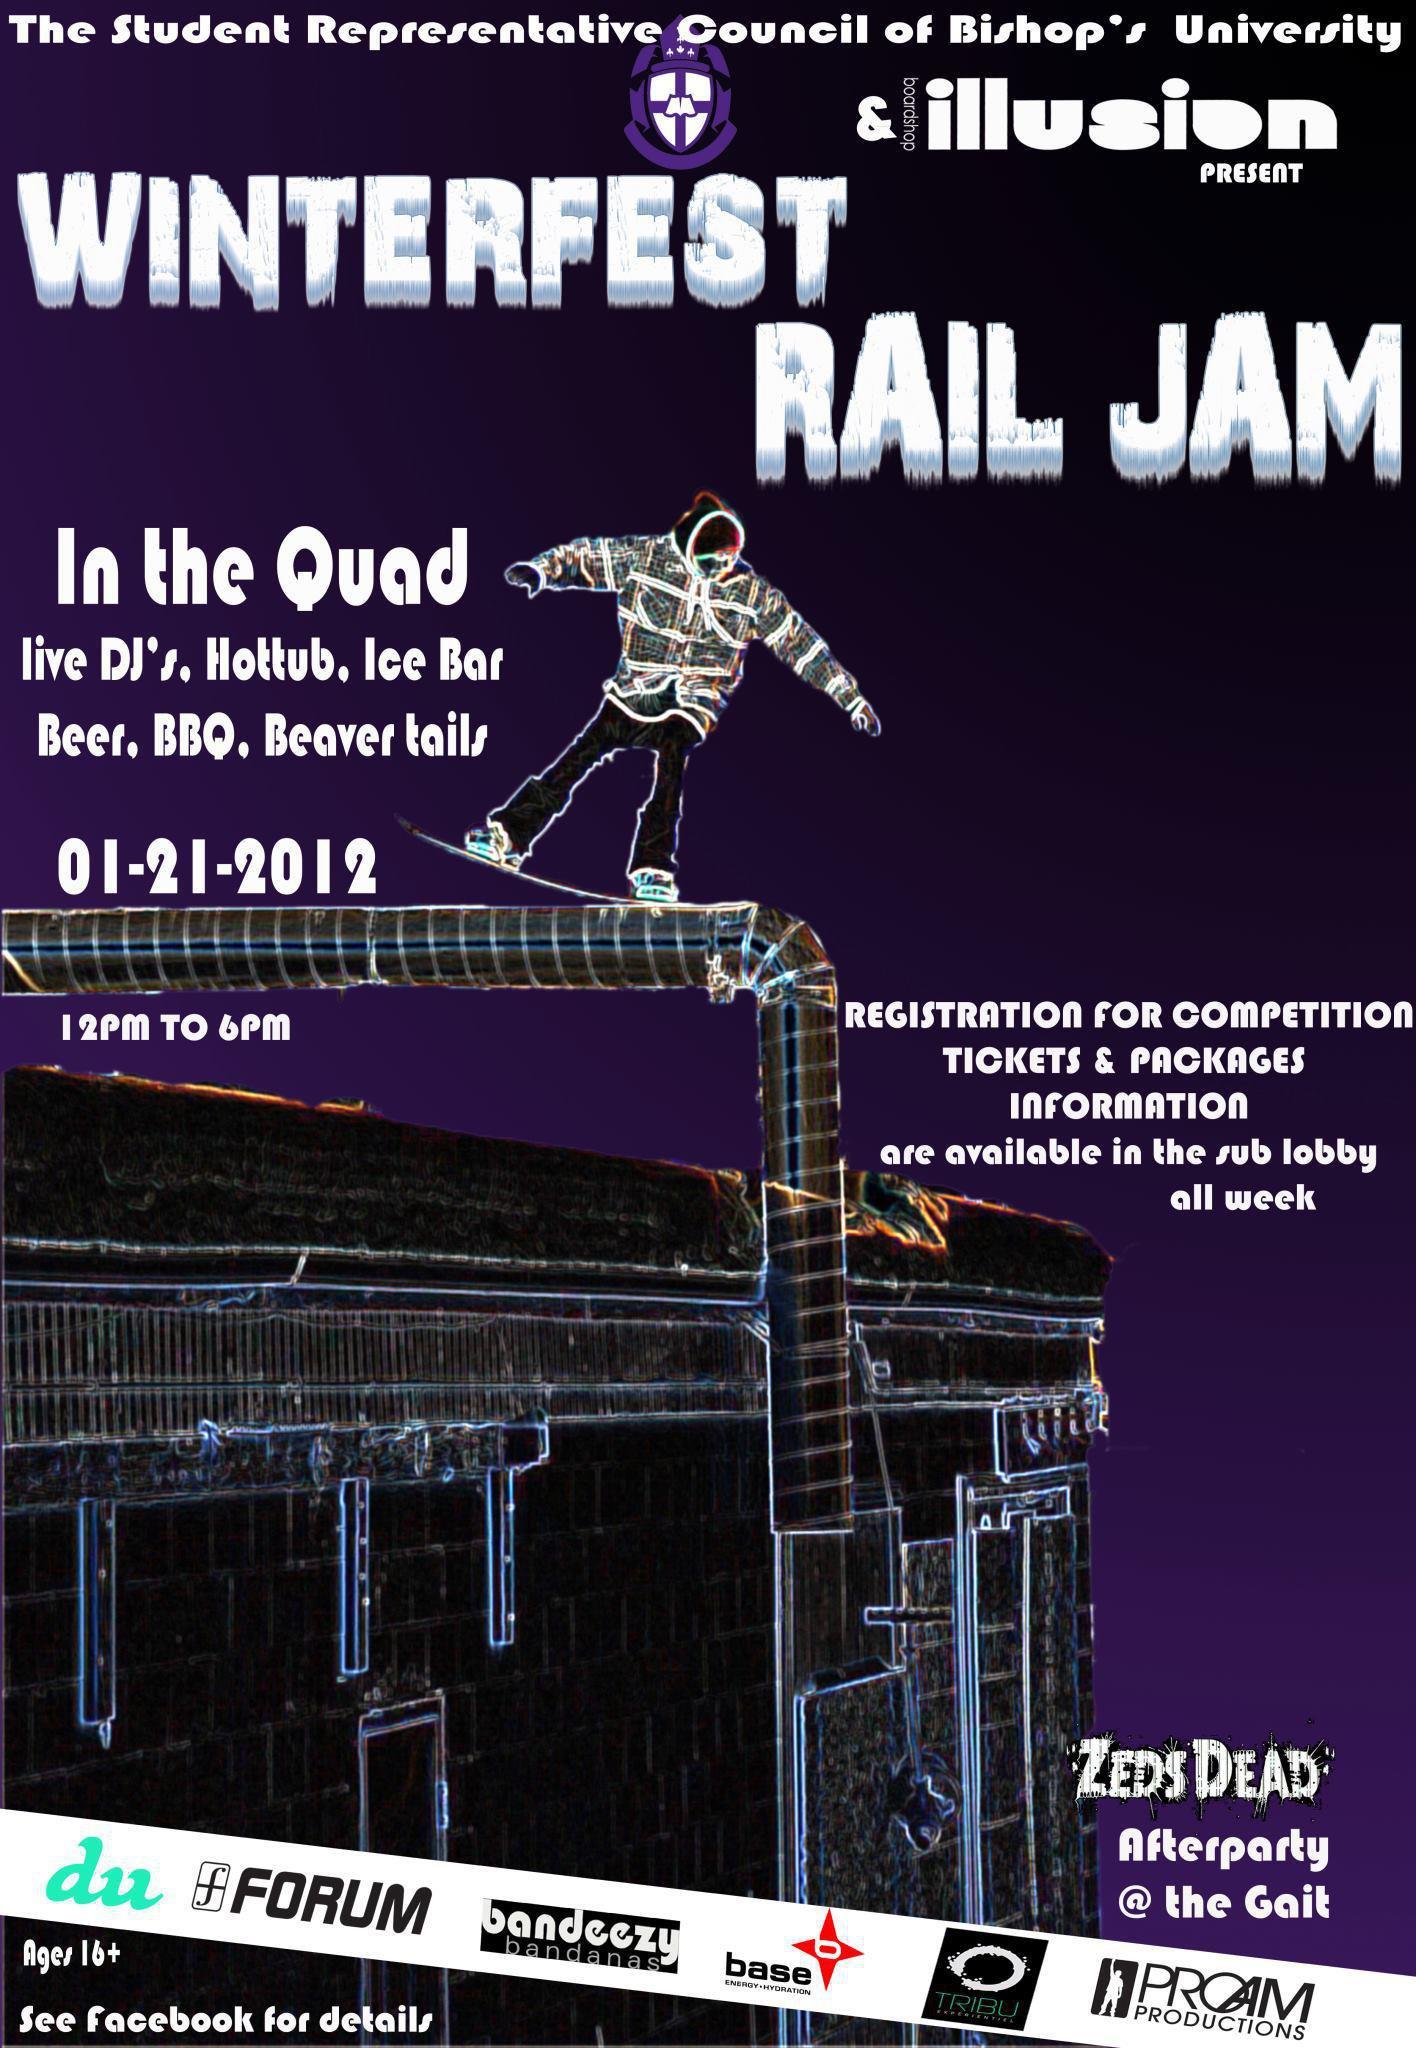 Bishops University Rail Jam